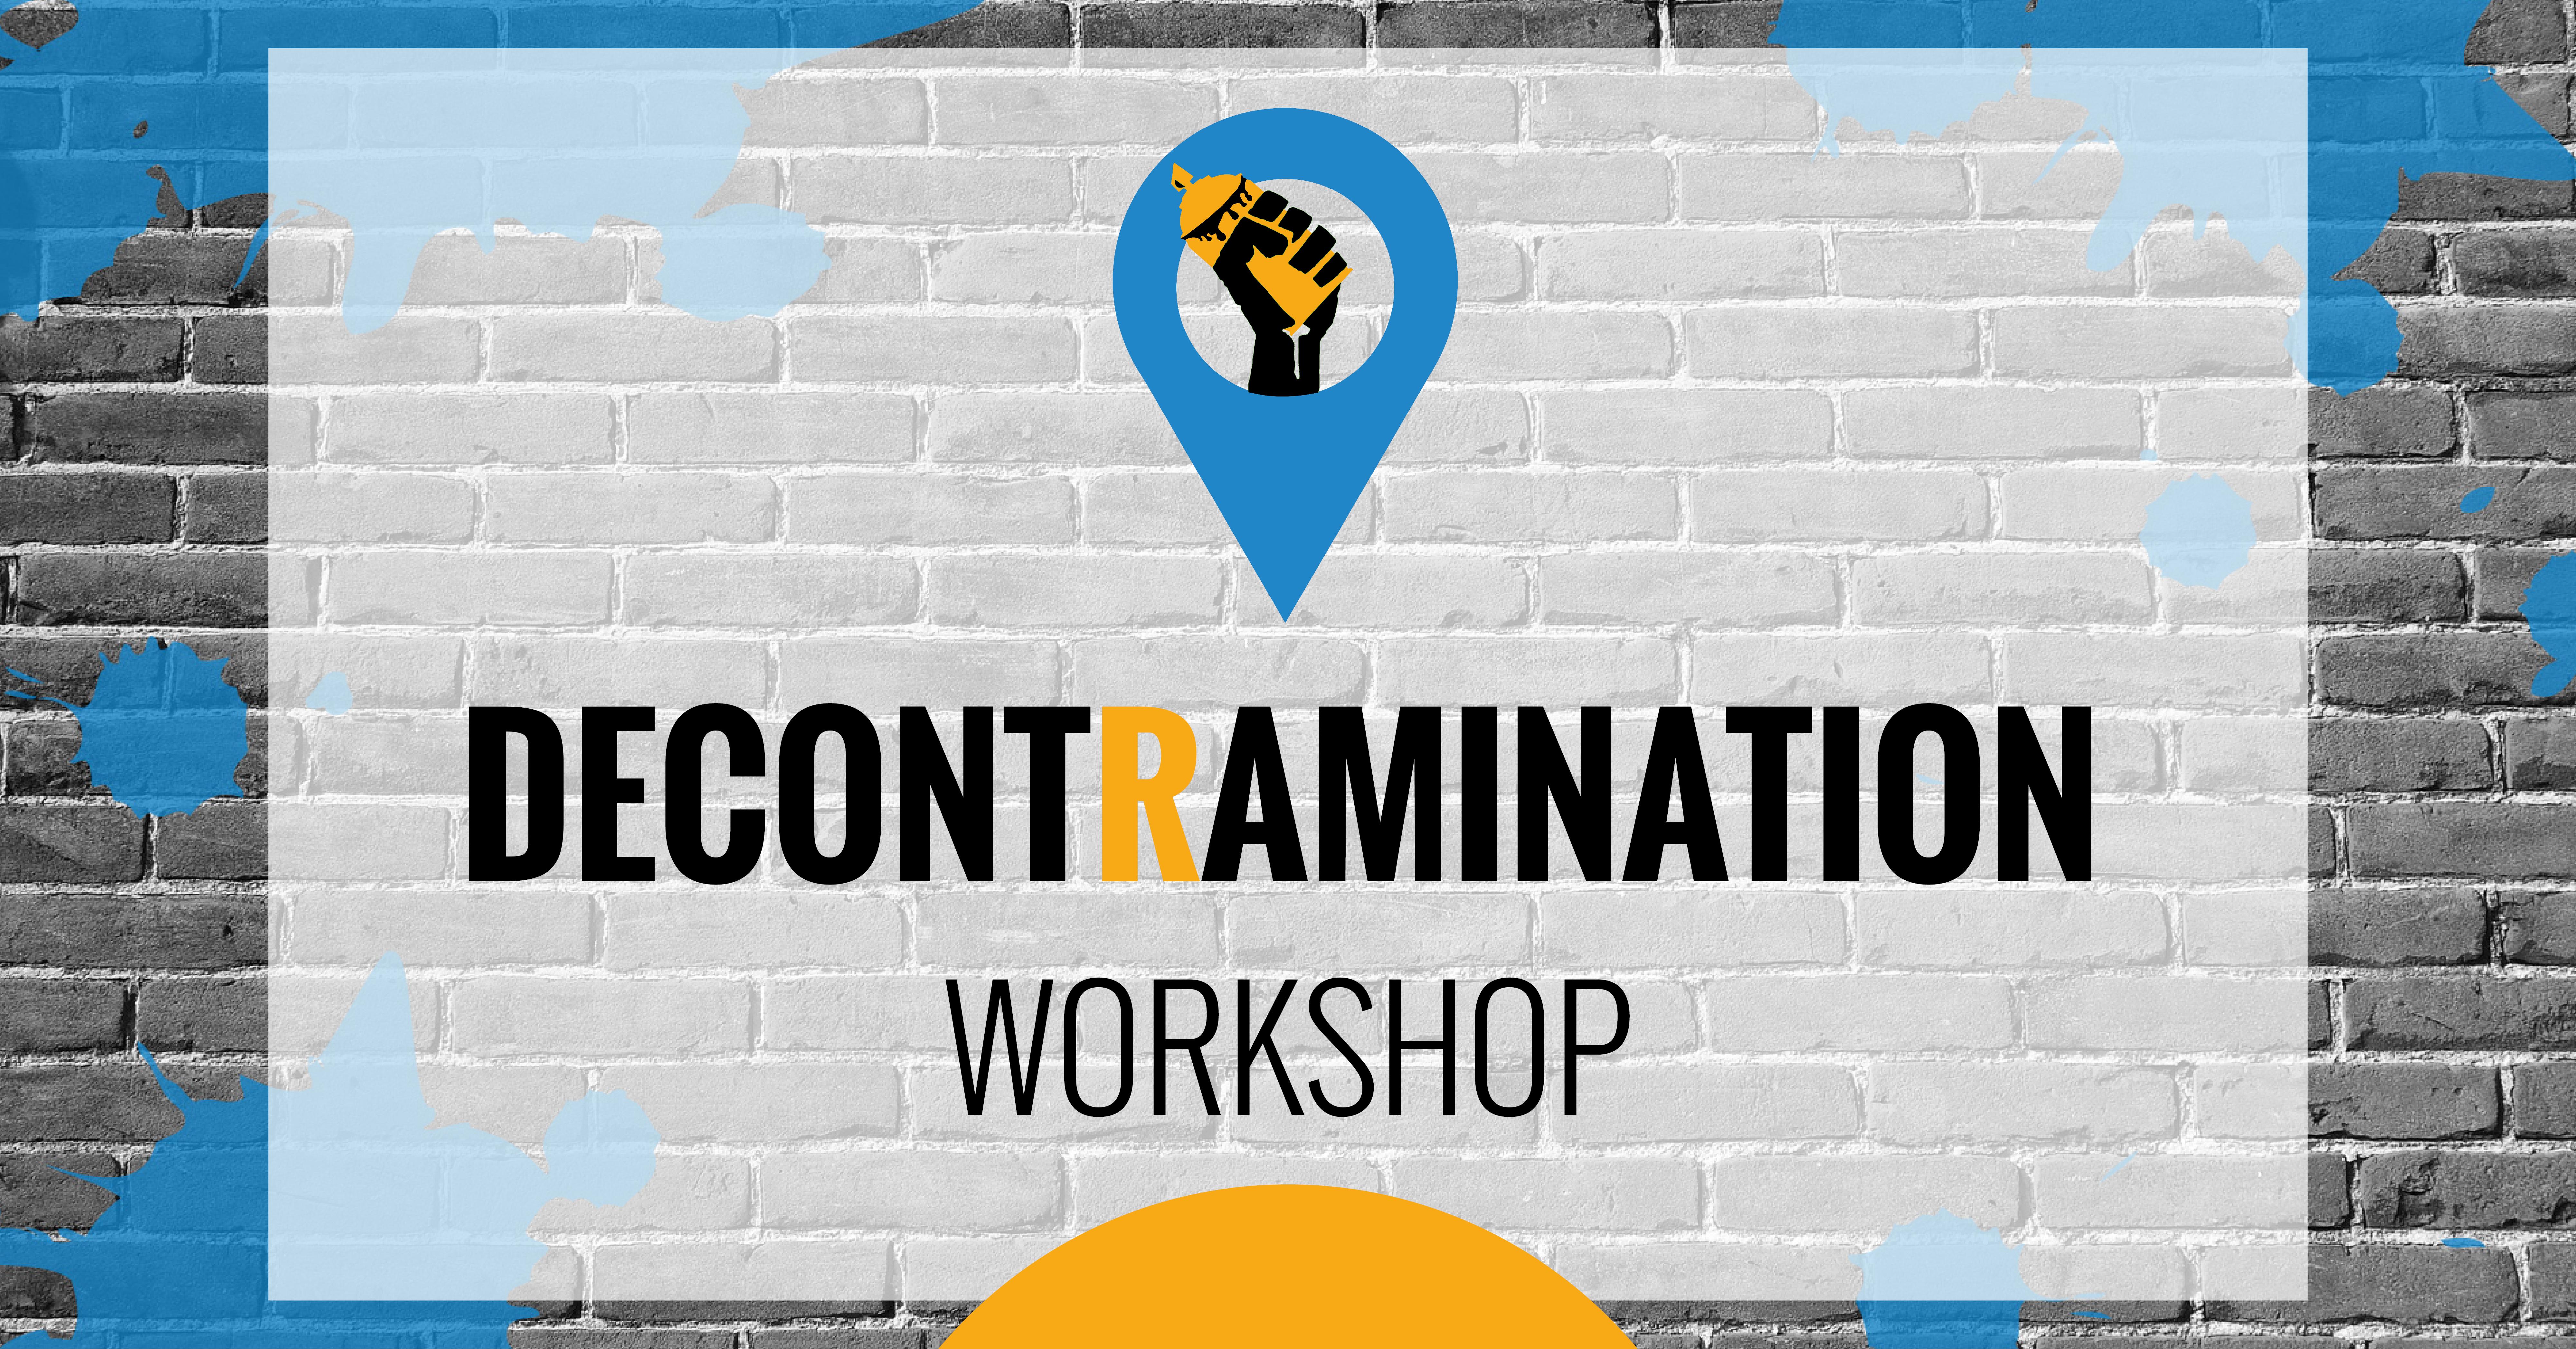 DecontRamination Workshop